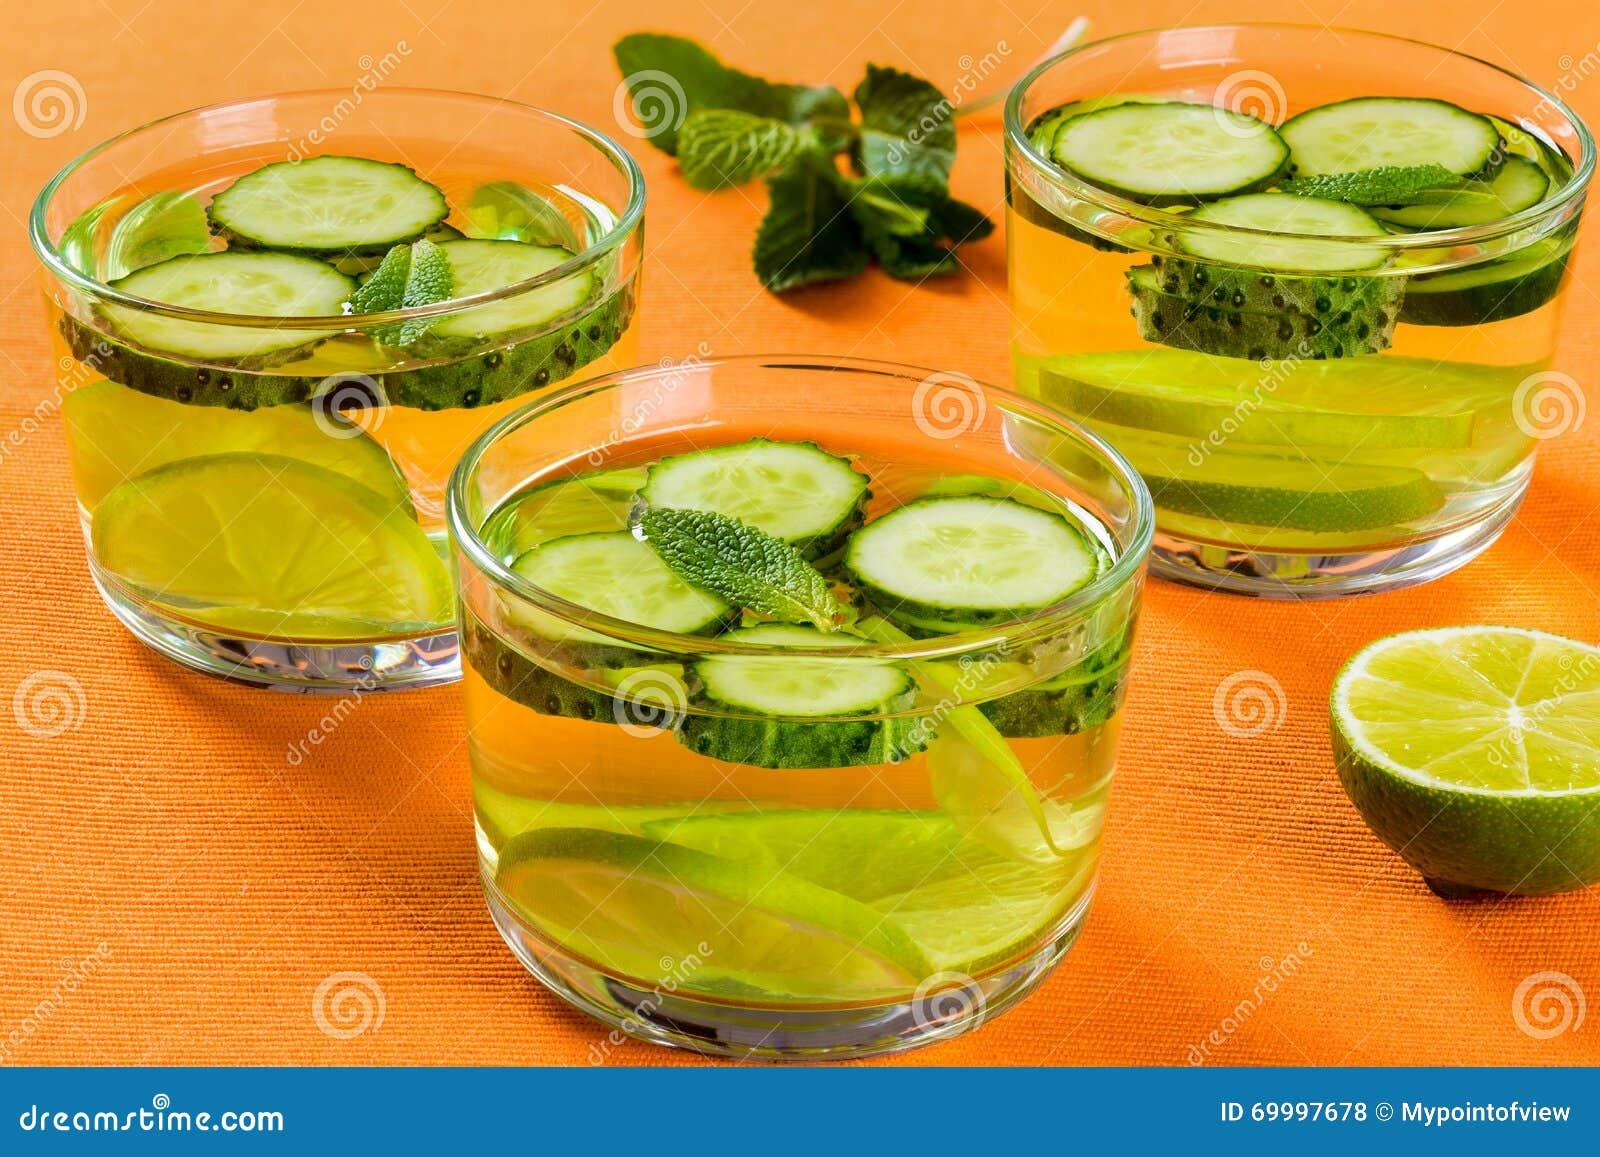 Fettes Brennendes Detox-Getränk - Freches Wasser, Nahaufnahme ...